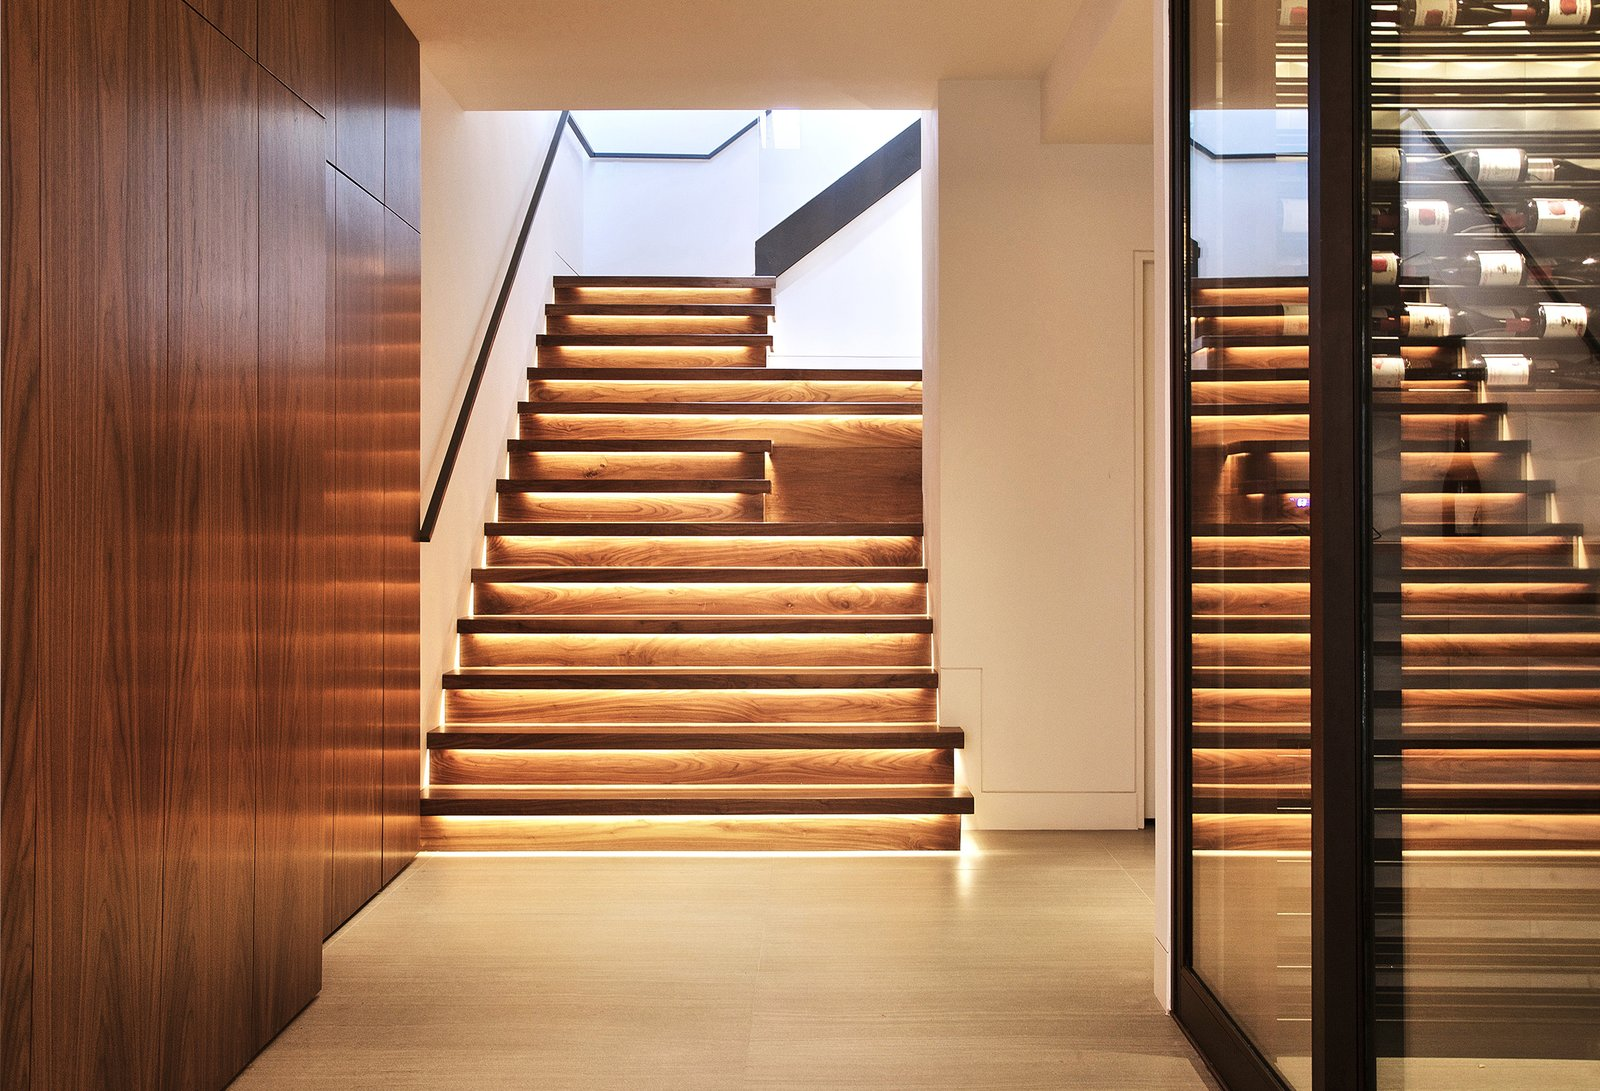 Cascading Walnut Stairs w/ LED lights